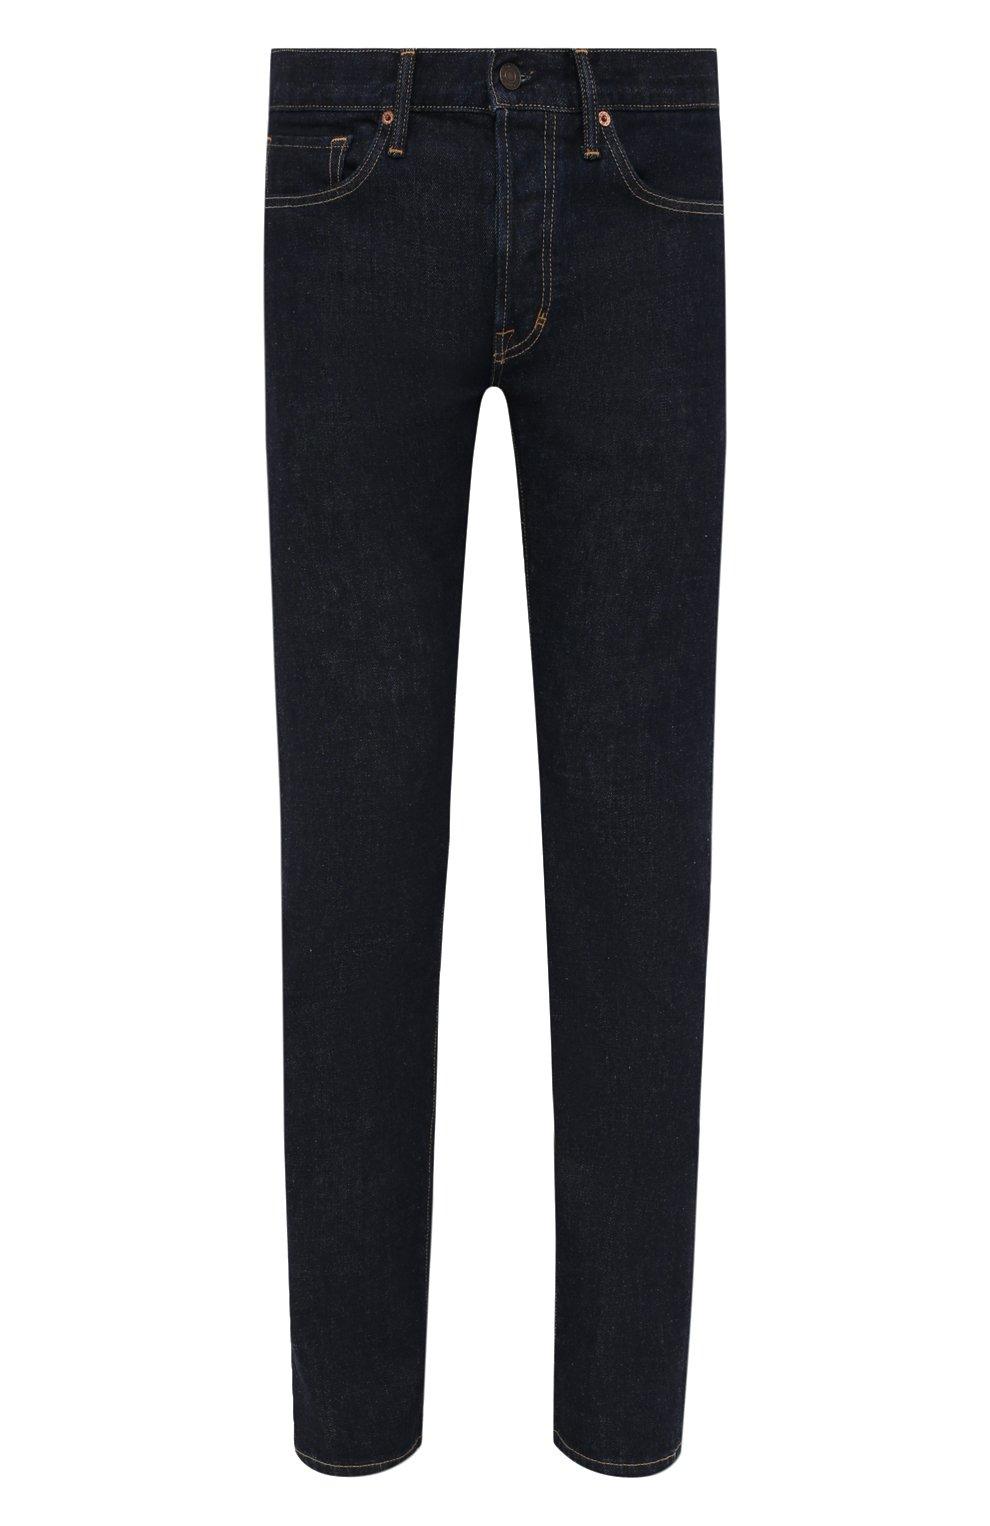 Мужские джинсы TOM FORD темно-синего цвета, арт. BVJ18/TFD002 | Фото 1